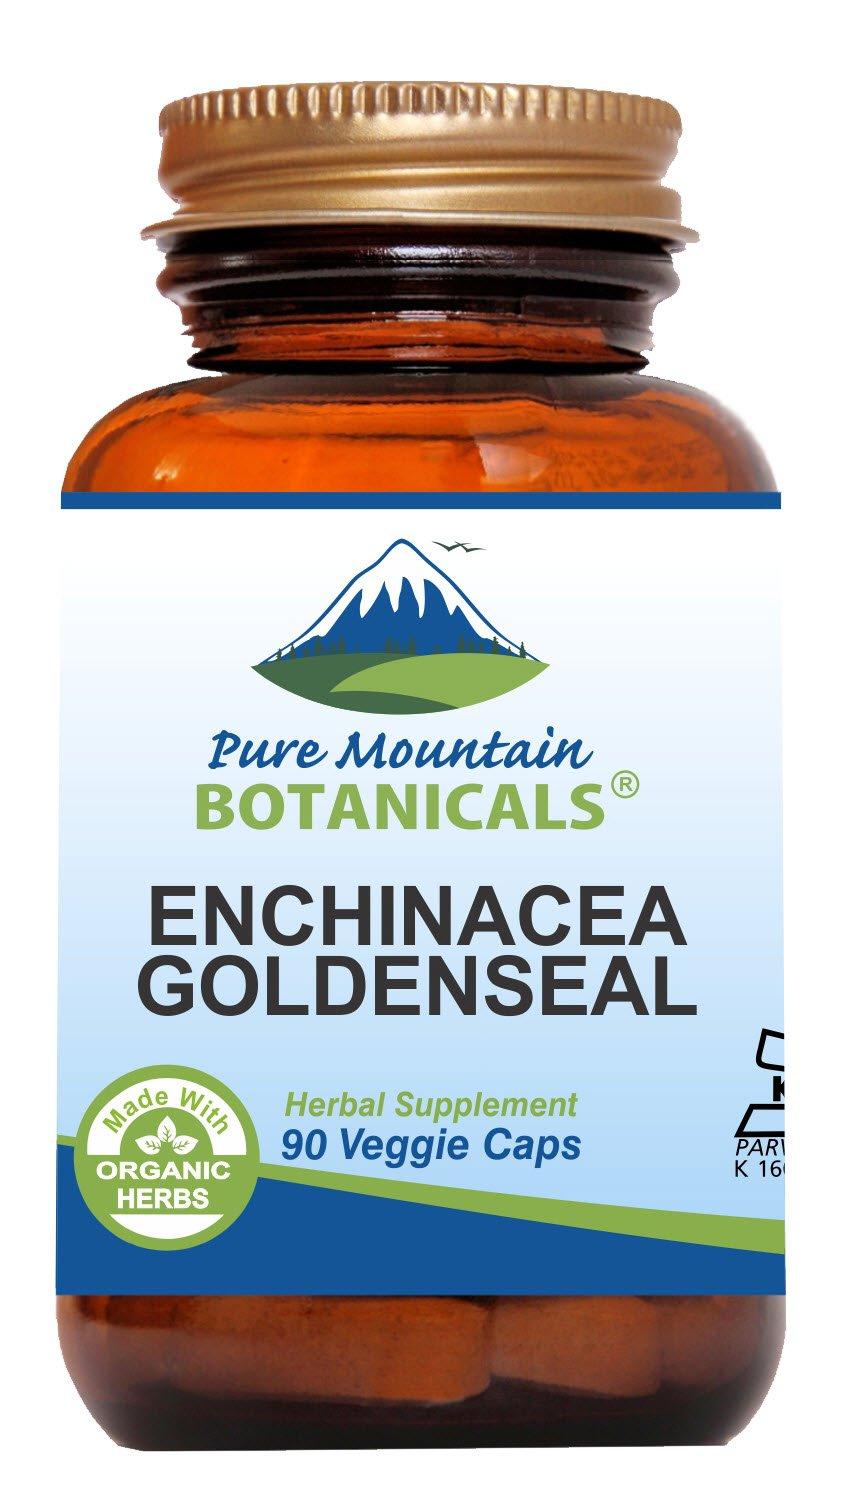 Echinacea Goldenseal Capsules - 90 Kosher Vegan Caps - Now with 450mg Organic Echinacea Goldenseal Complex - Nature's Gold Standard Supplement